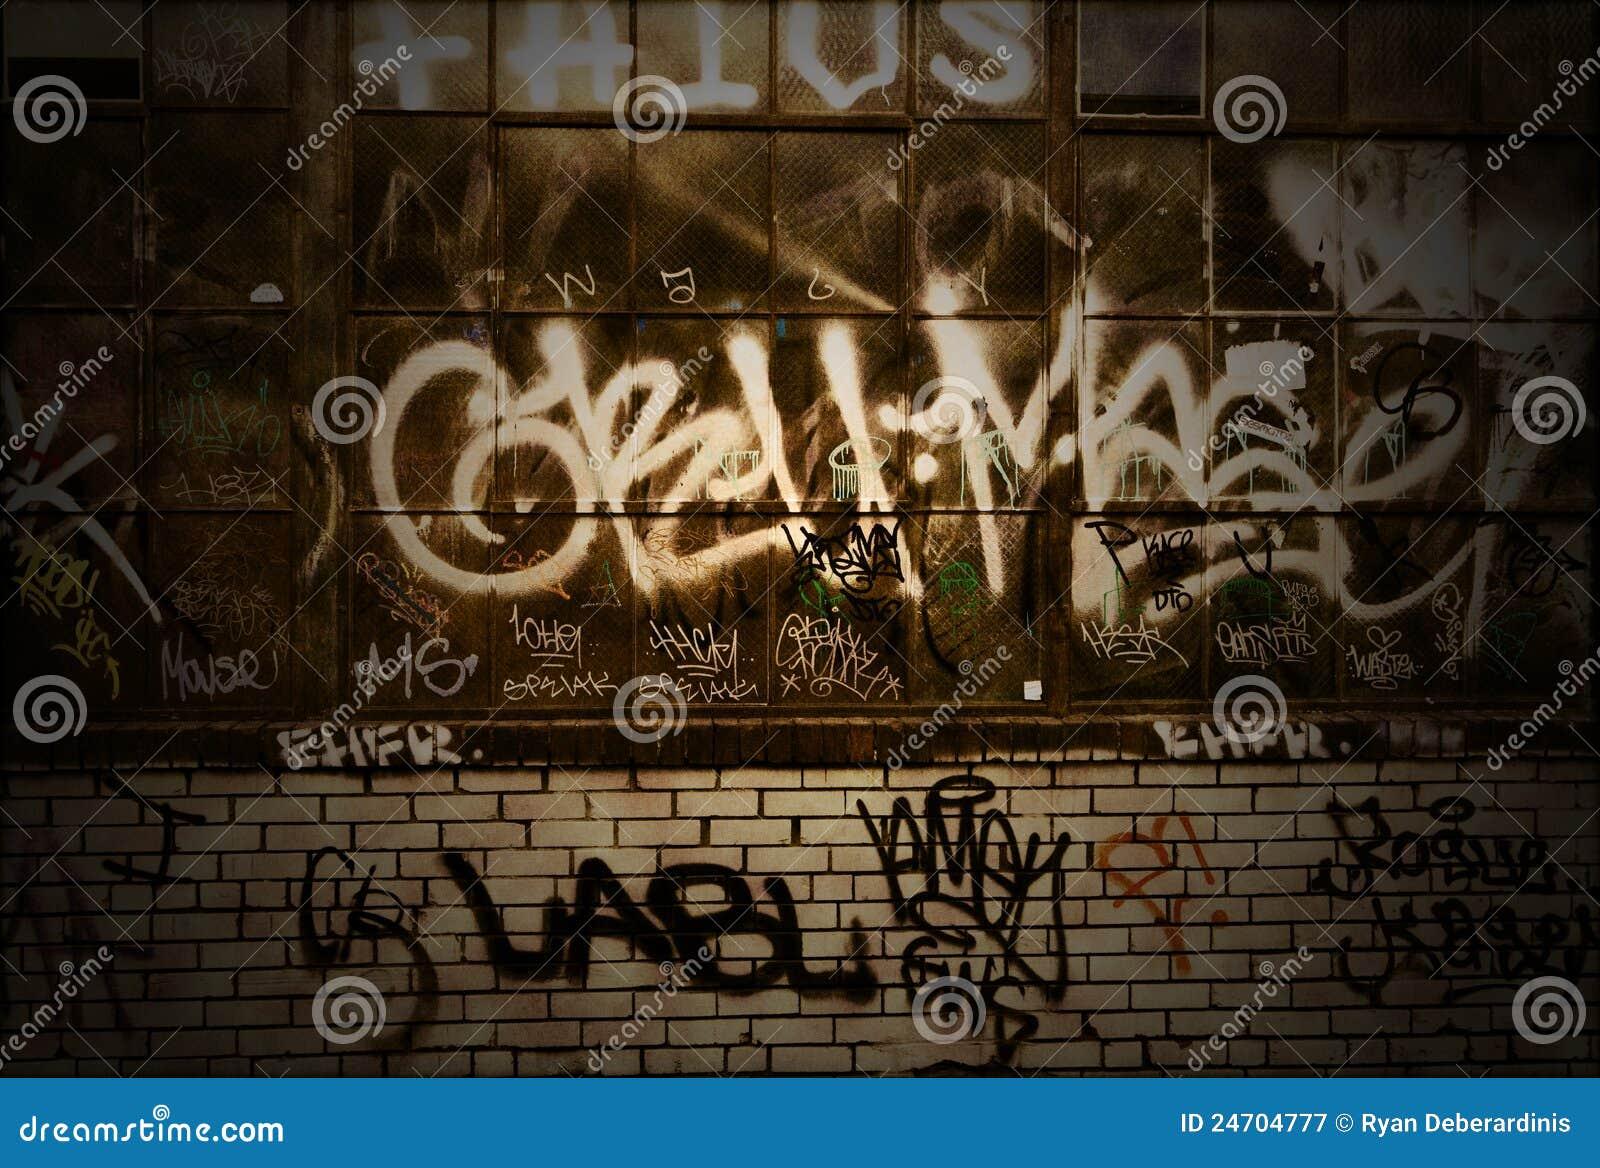 Texture grunge de fond de mur de briques de graffiti